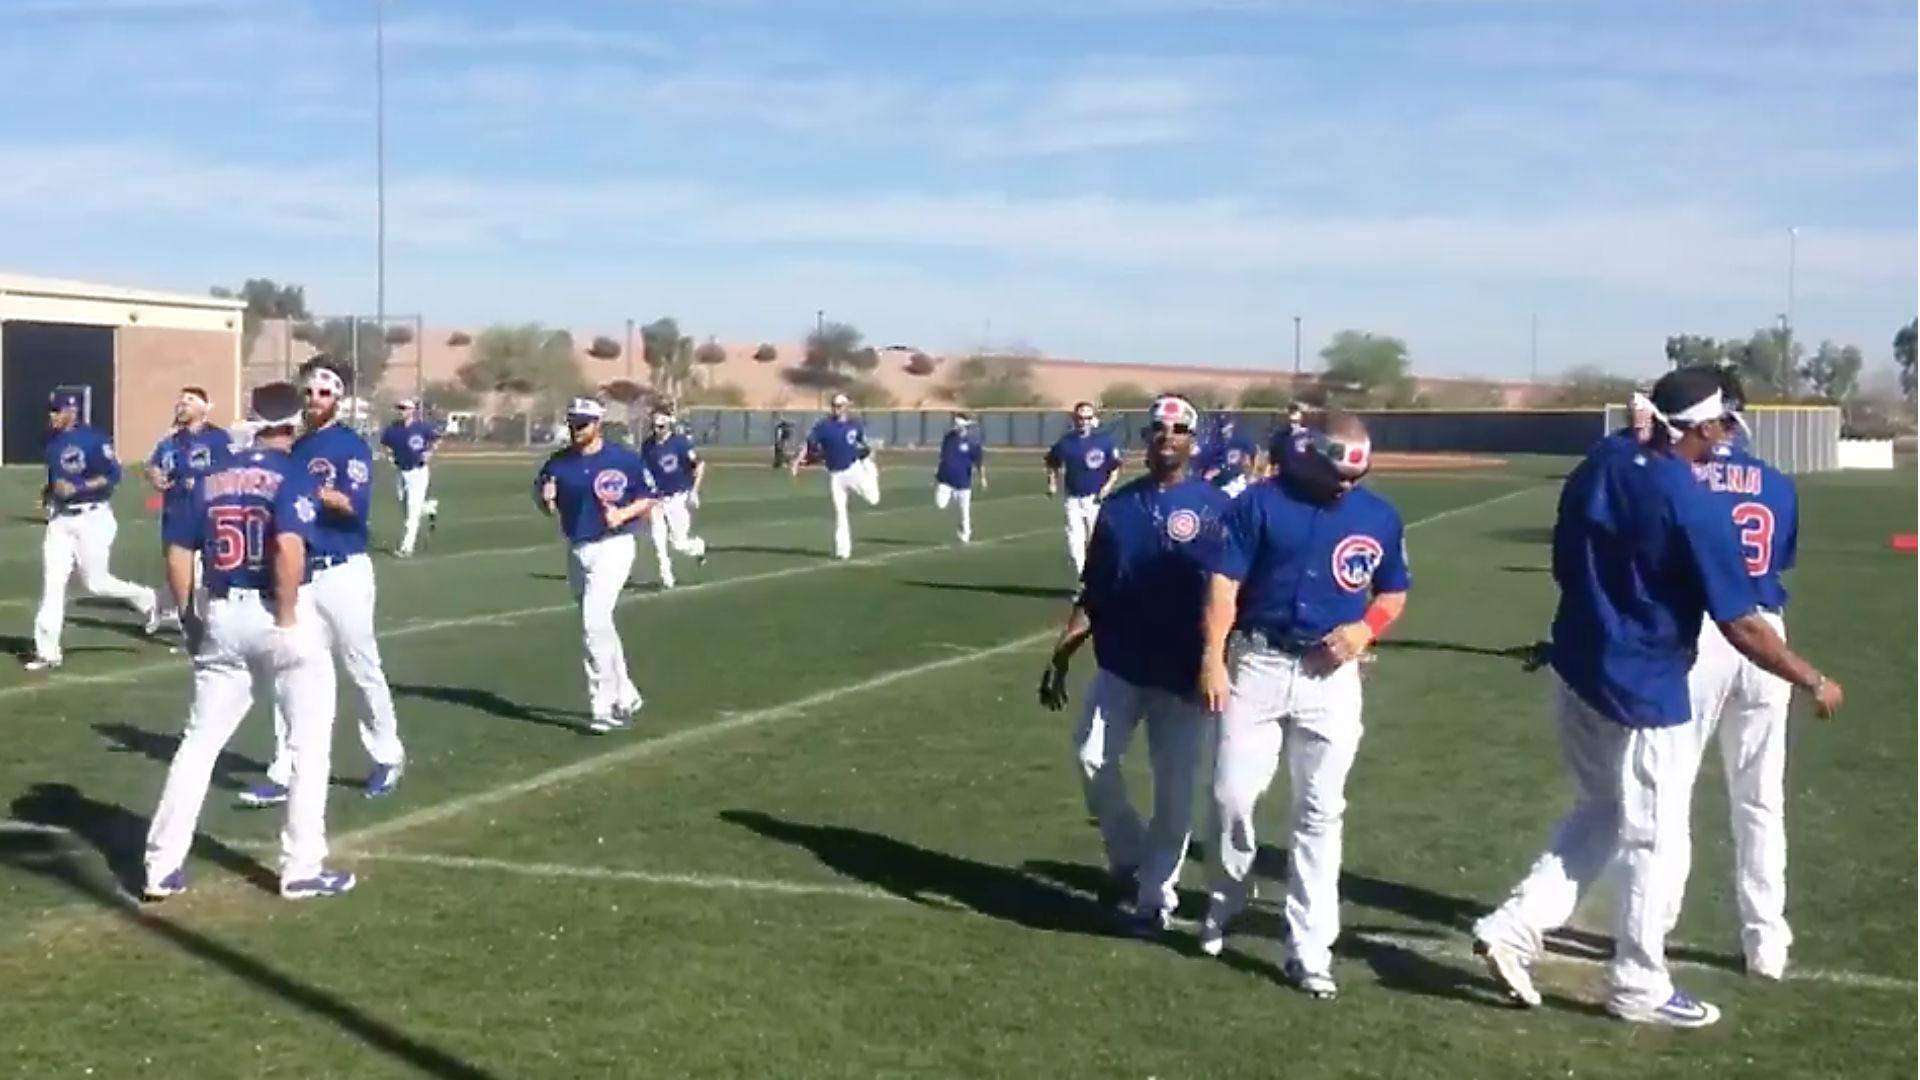 Cubs spring training - FTR